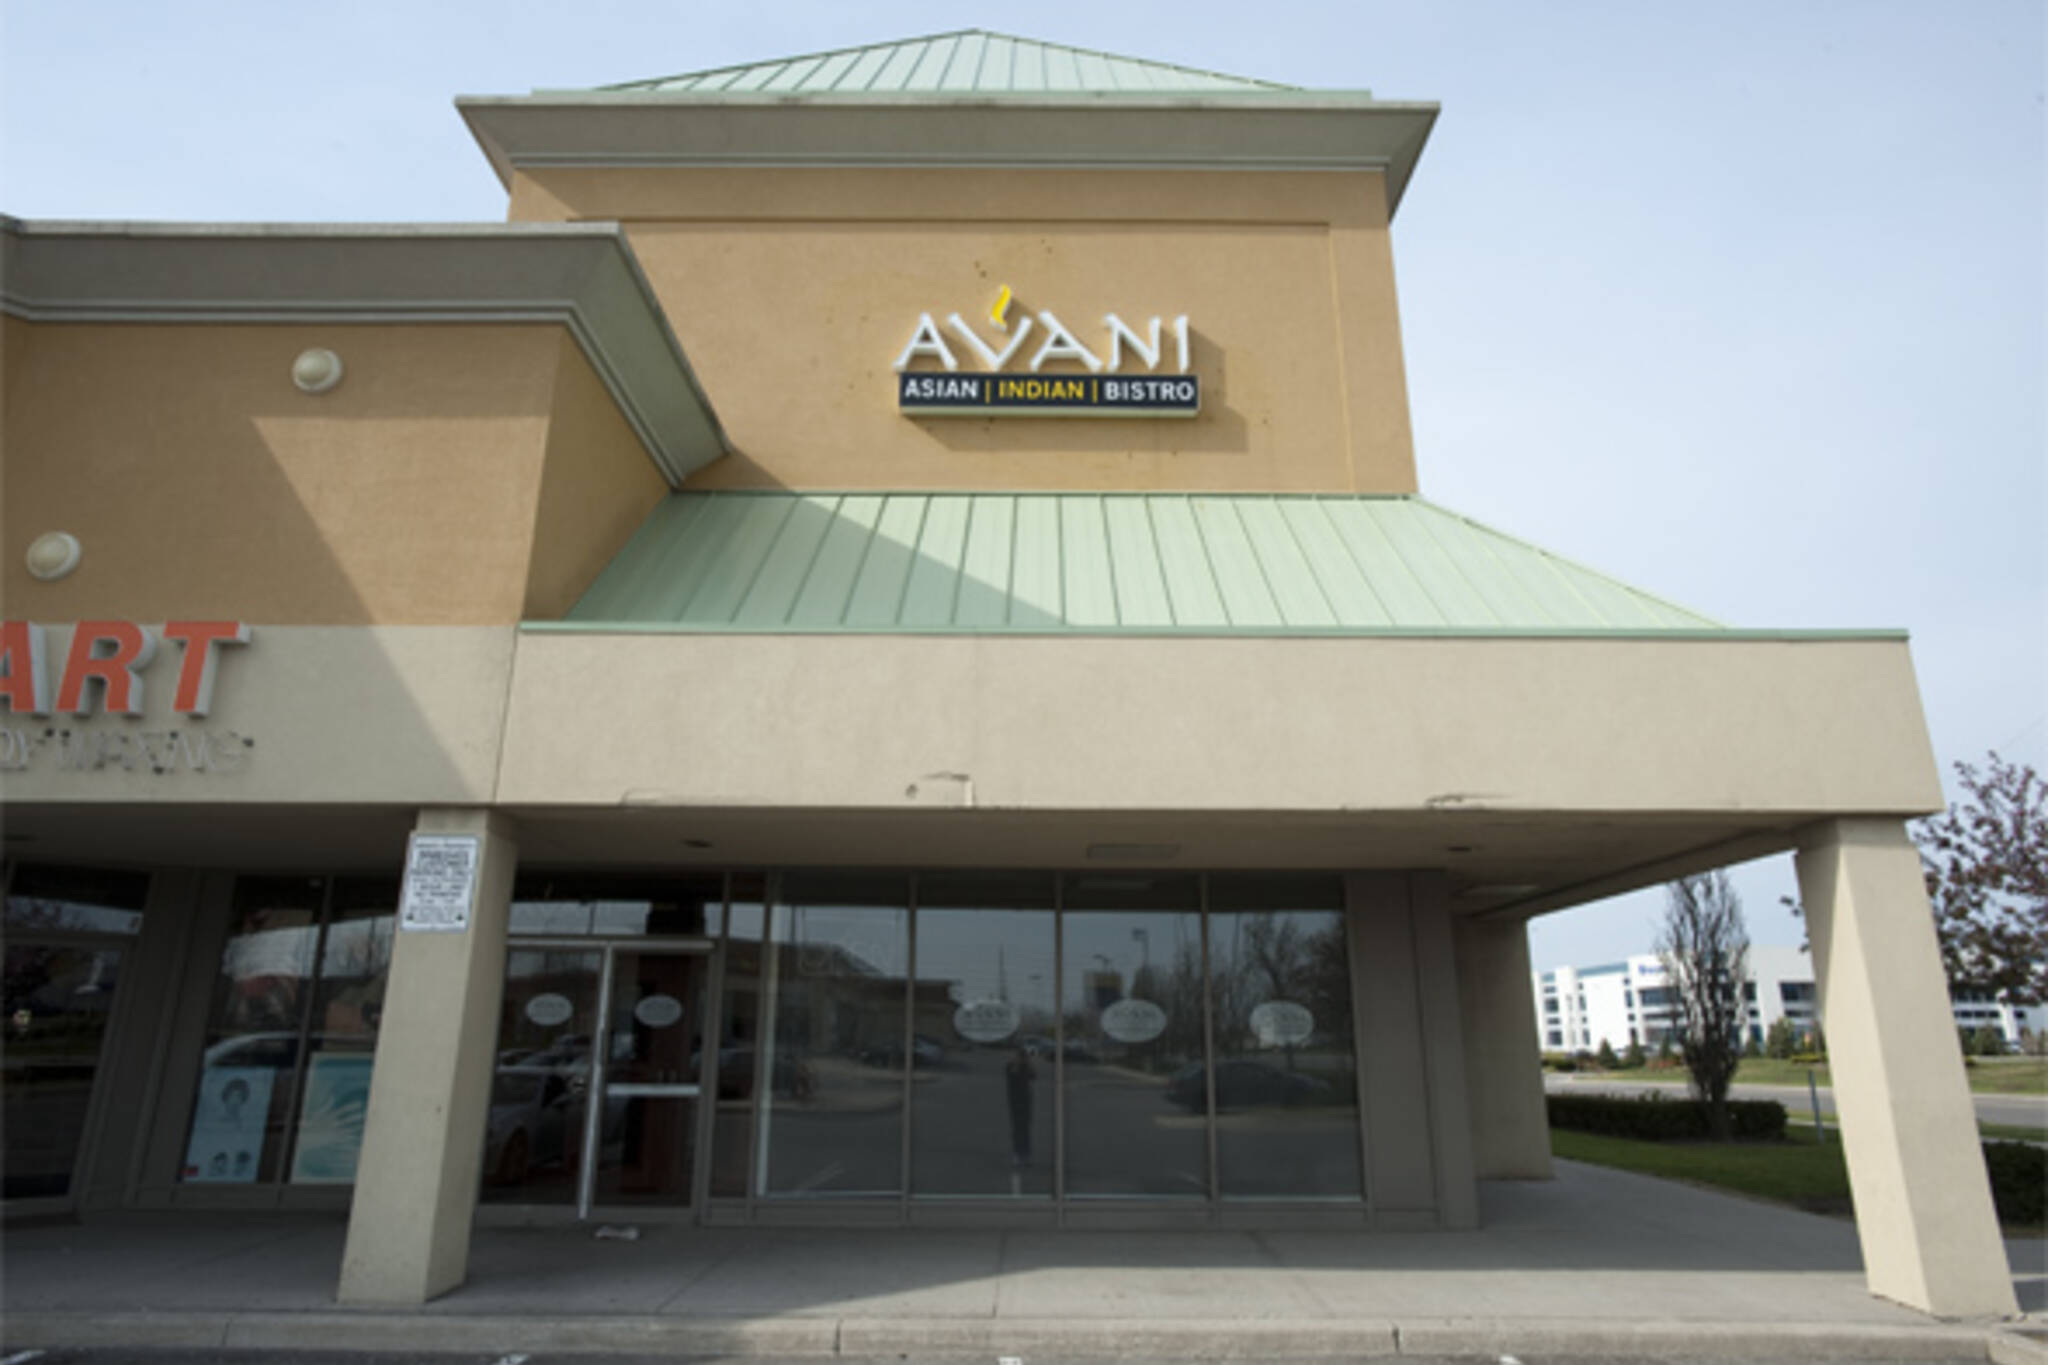 Avani Asian Indian Bistro